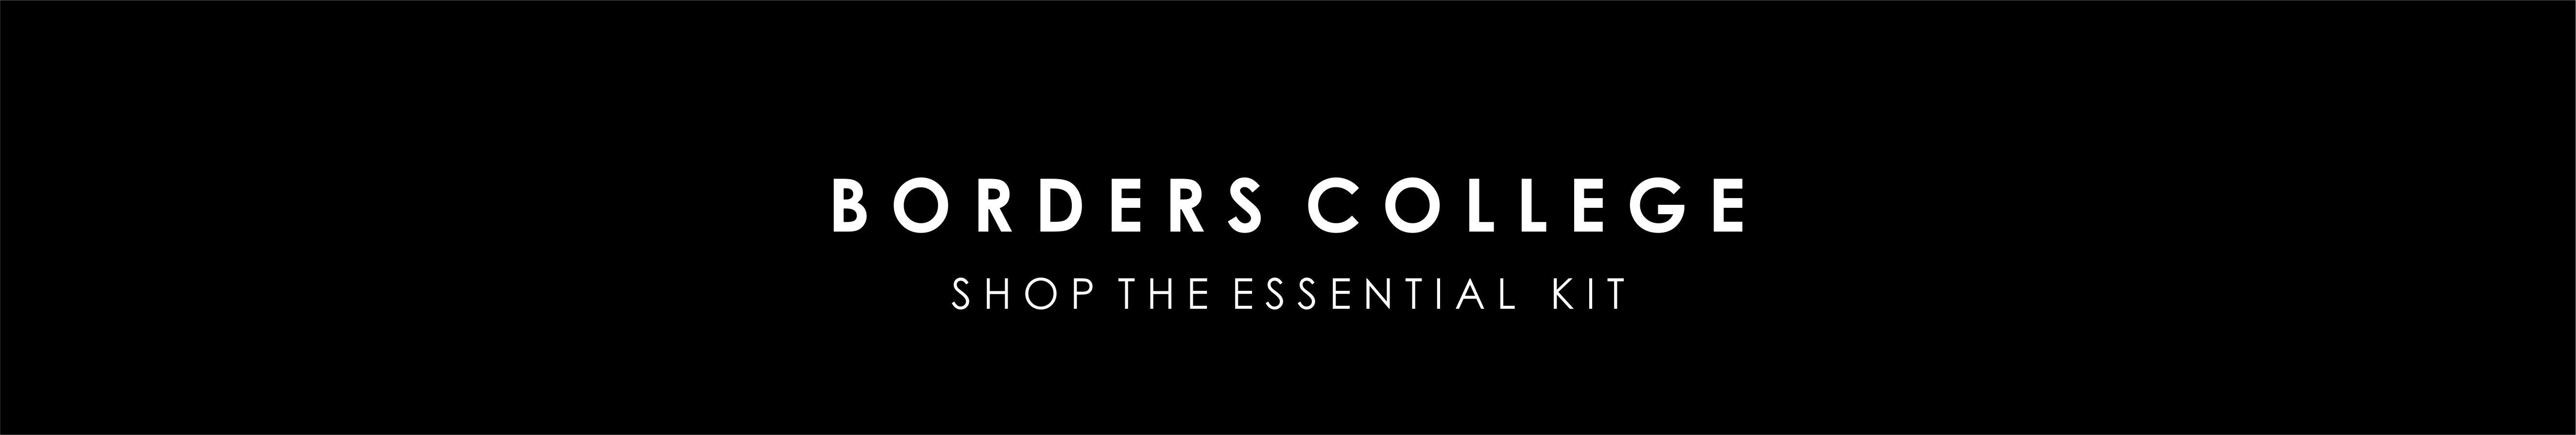 borders-college-banner-optional-extras.jpg